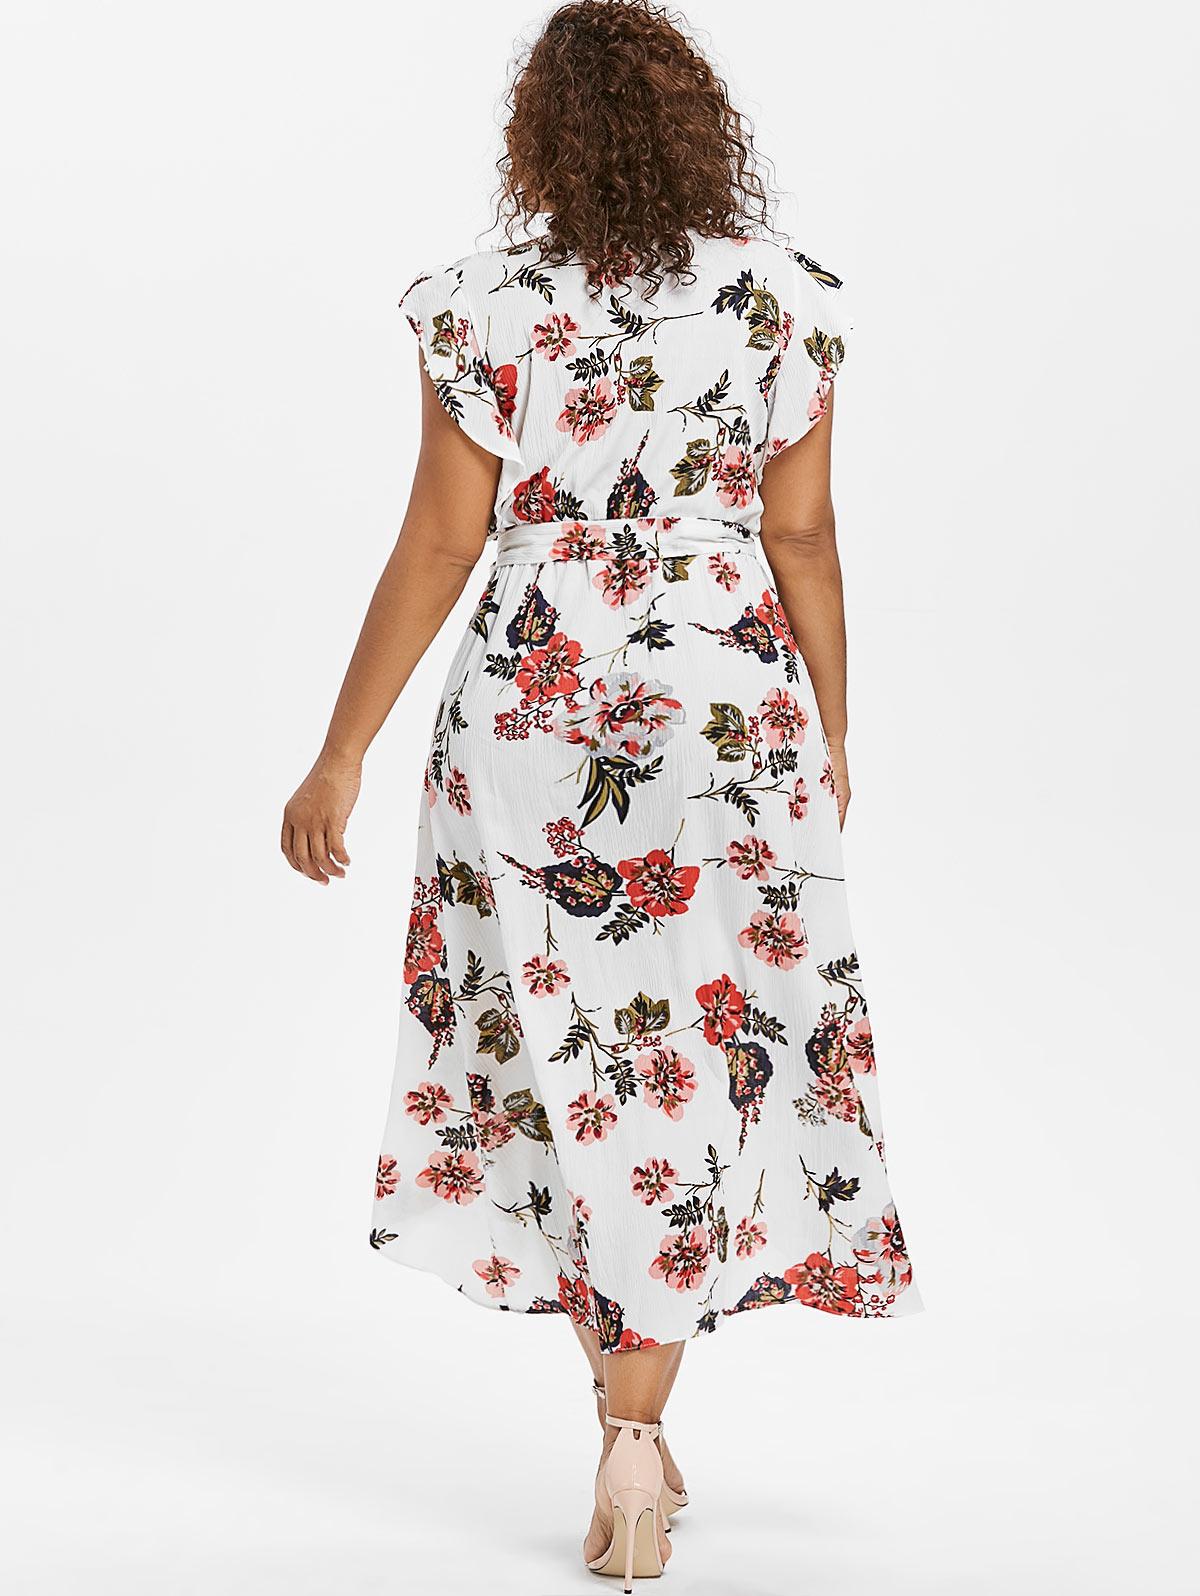 3XL Plus Size Butterfly Sleeve Flower Dress High Low V Neck Ruffle ... 6403b6dfa